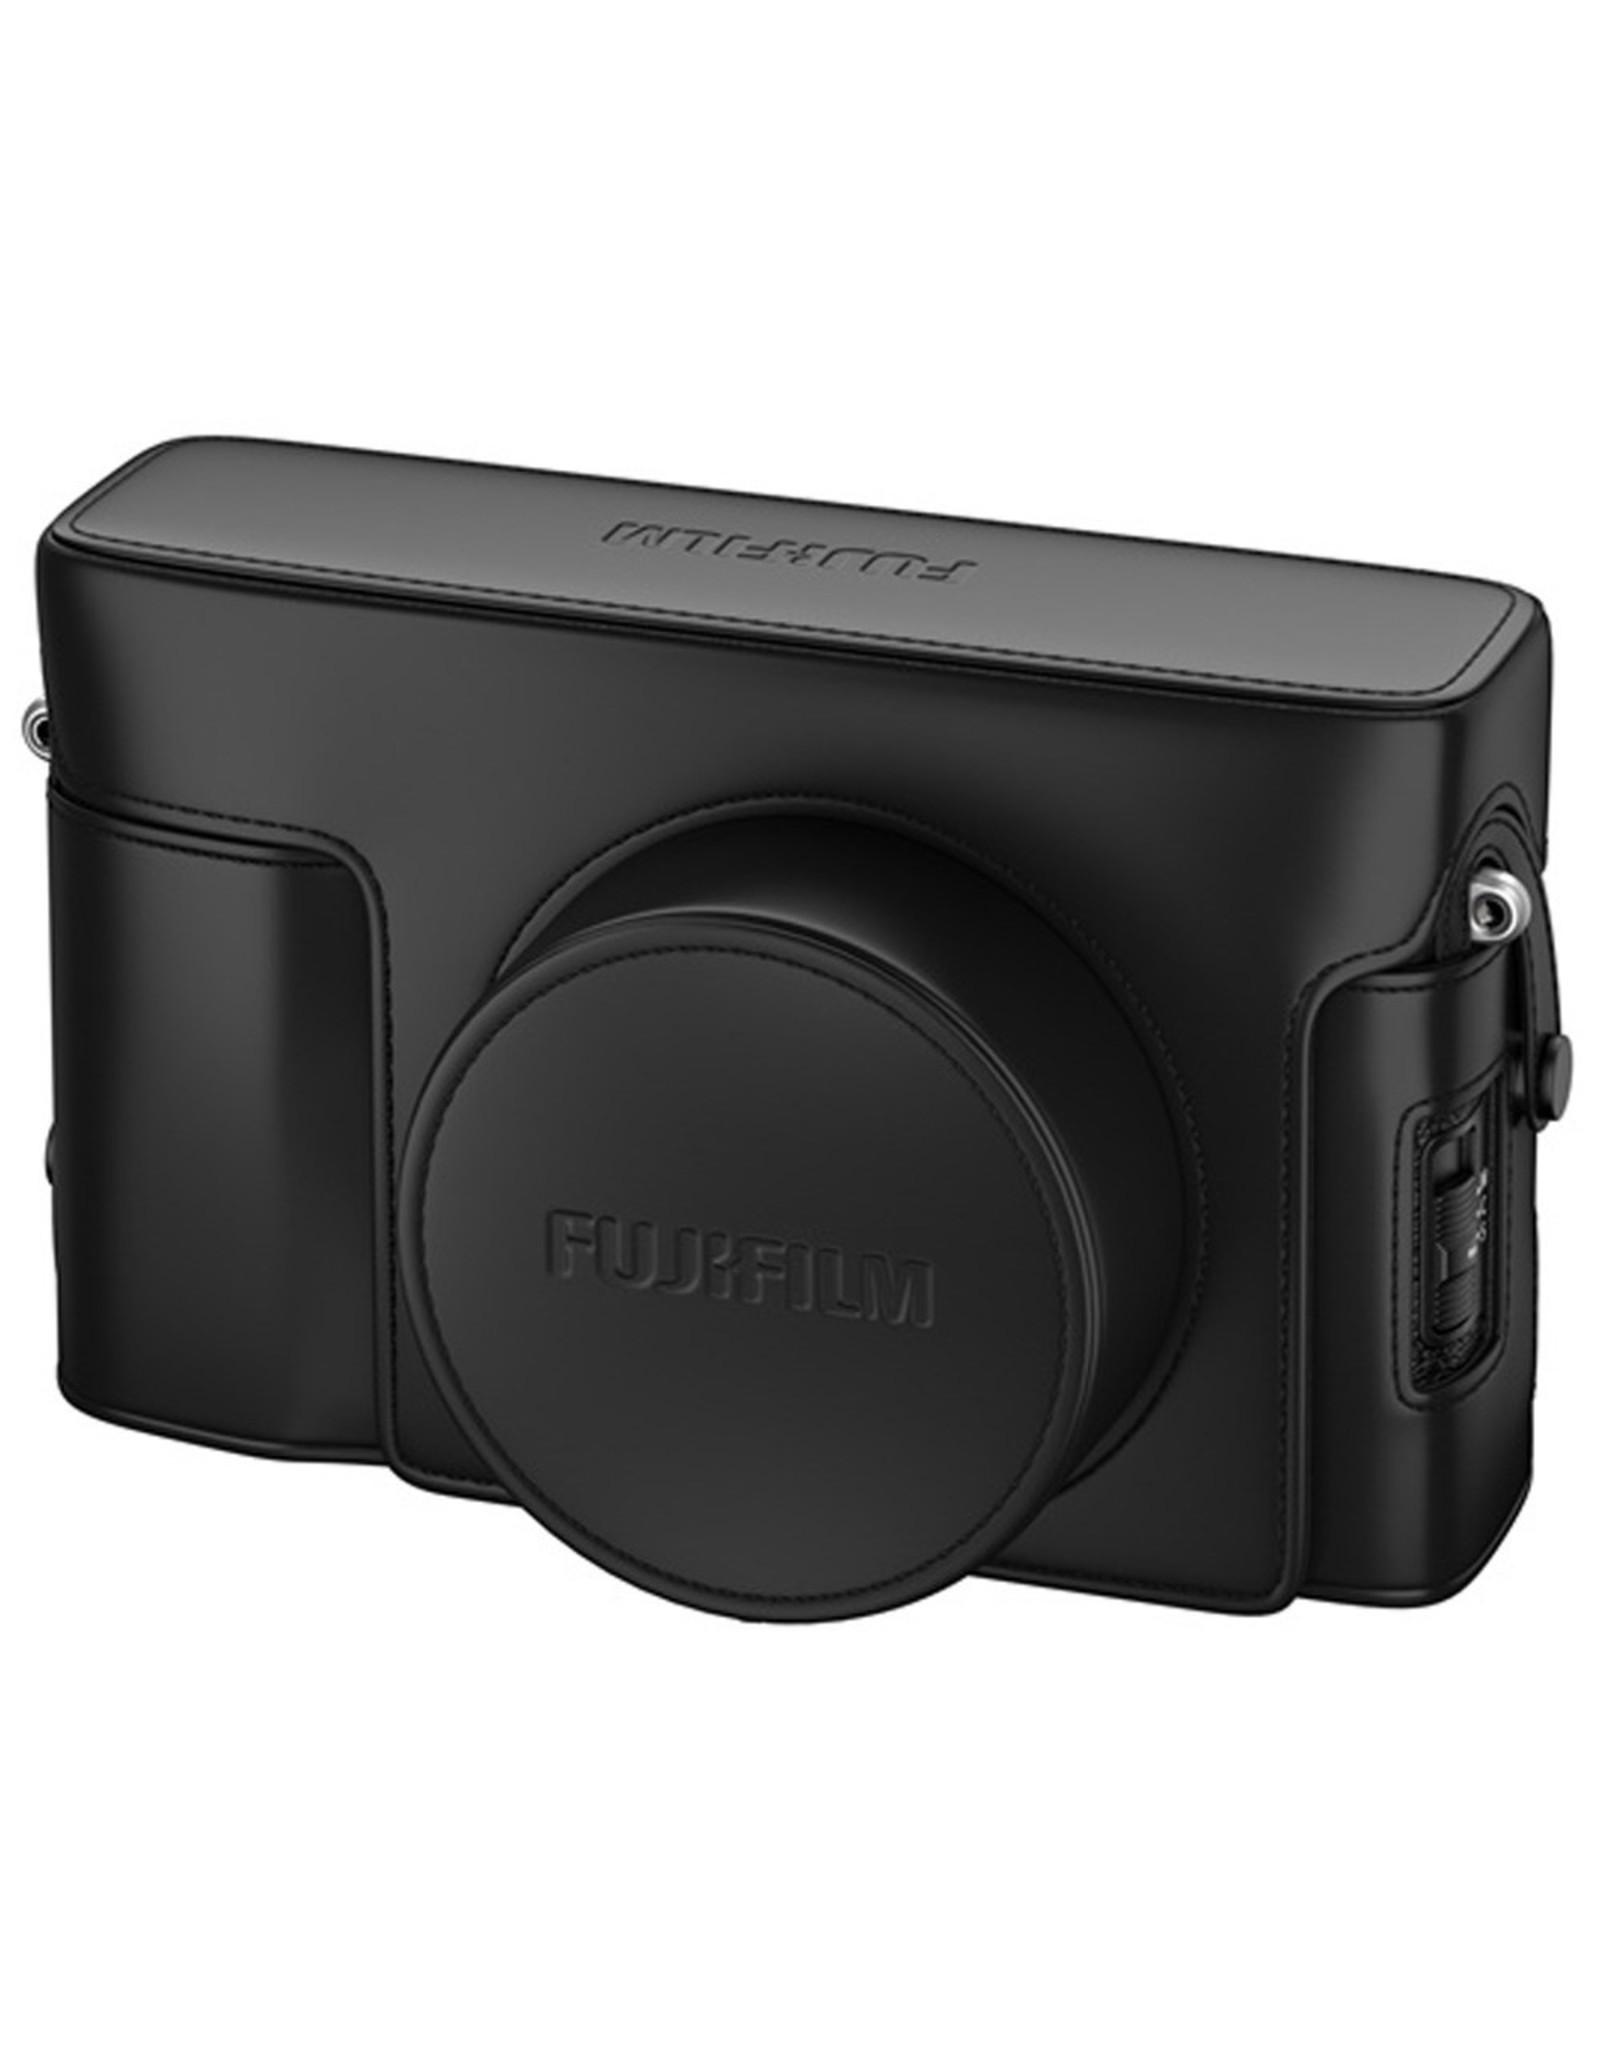 Fujifilm Fujifilm X100V Leather Case LC-X100V 16652609